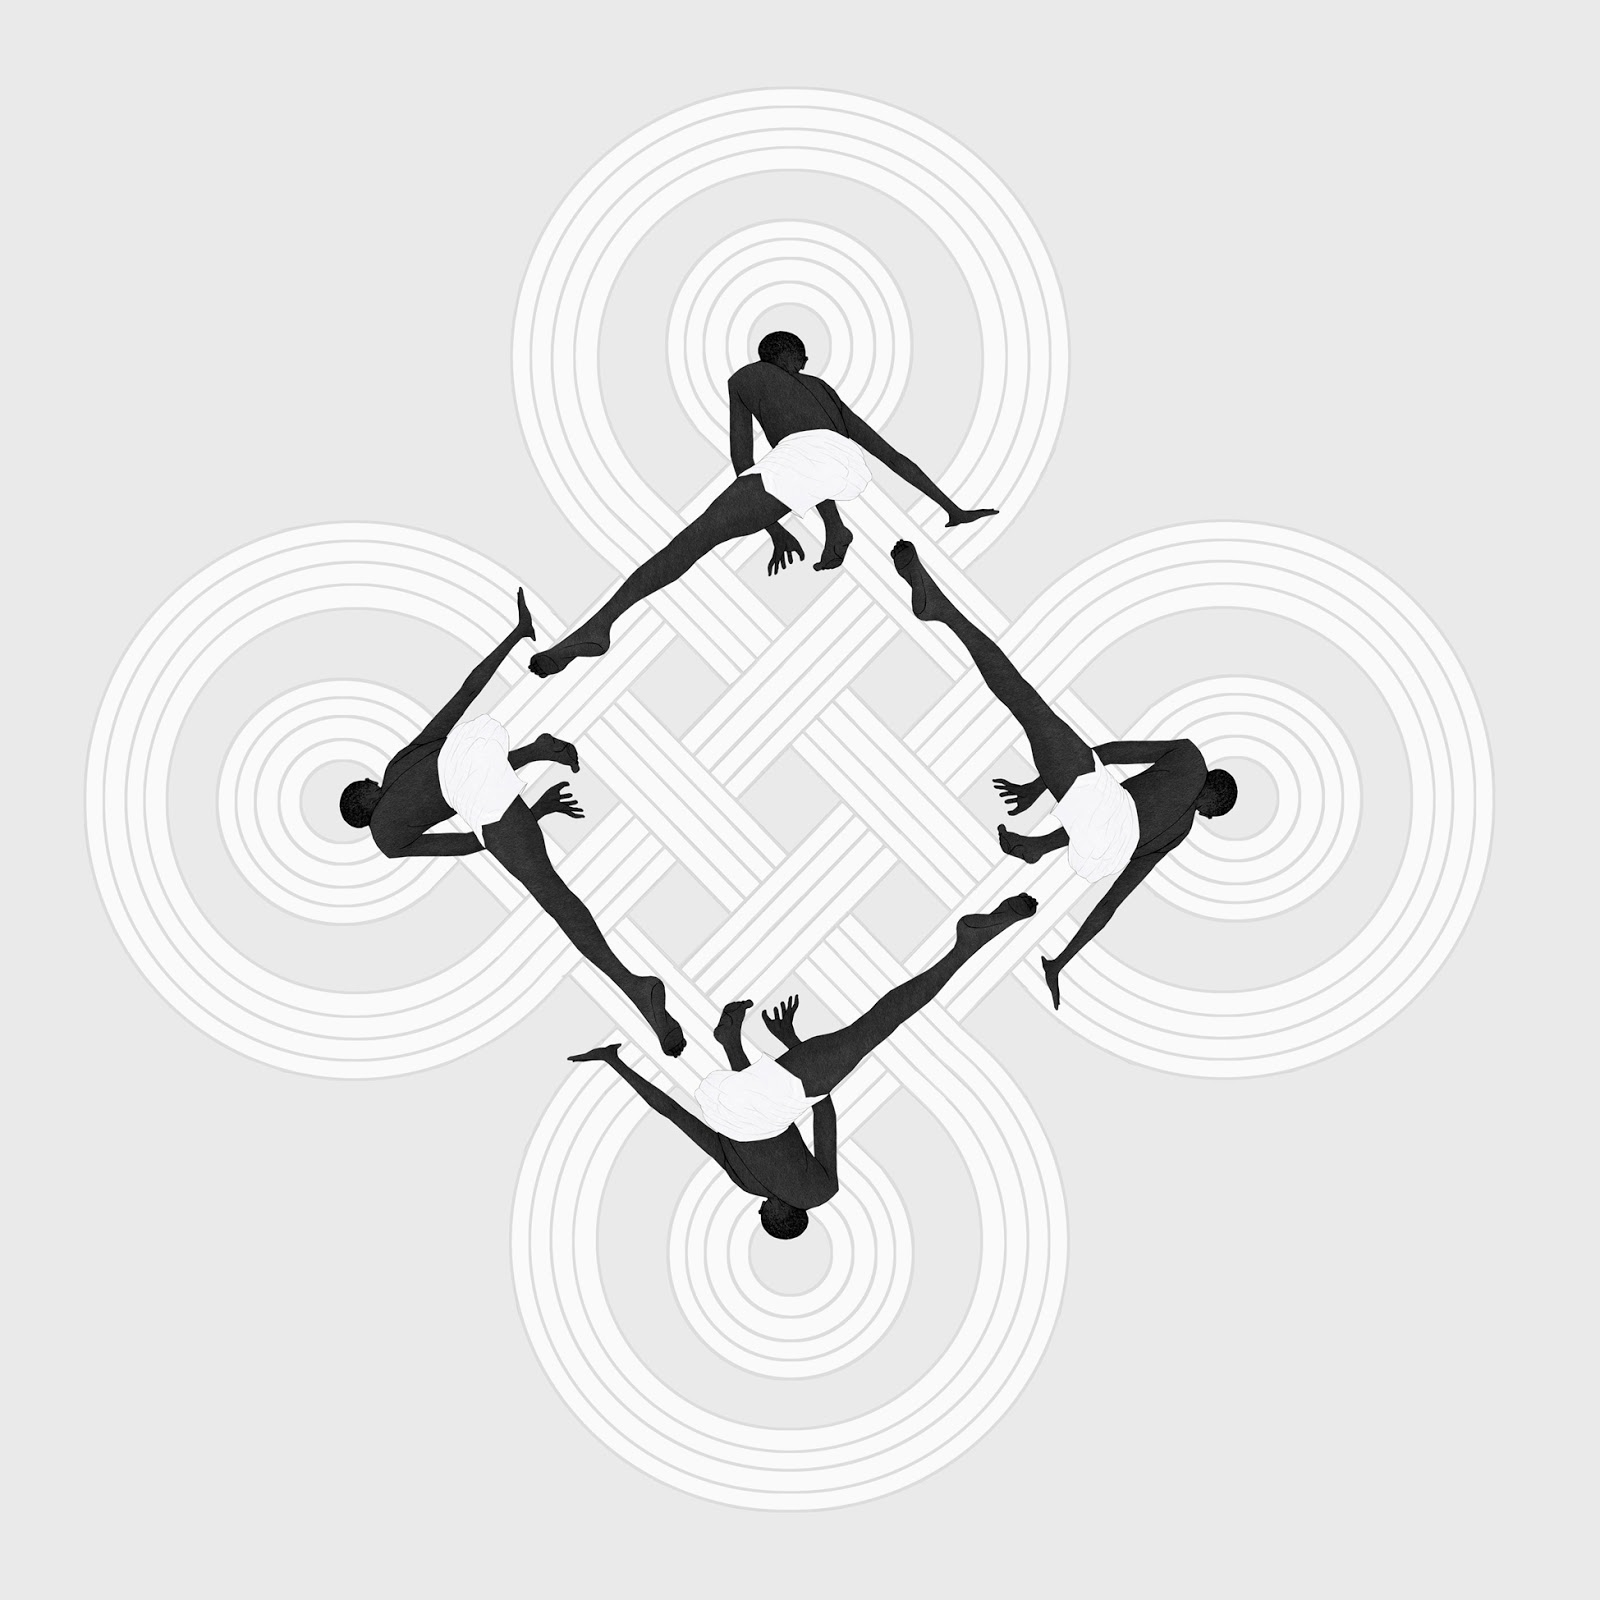 musica, danza, patrones visuales